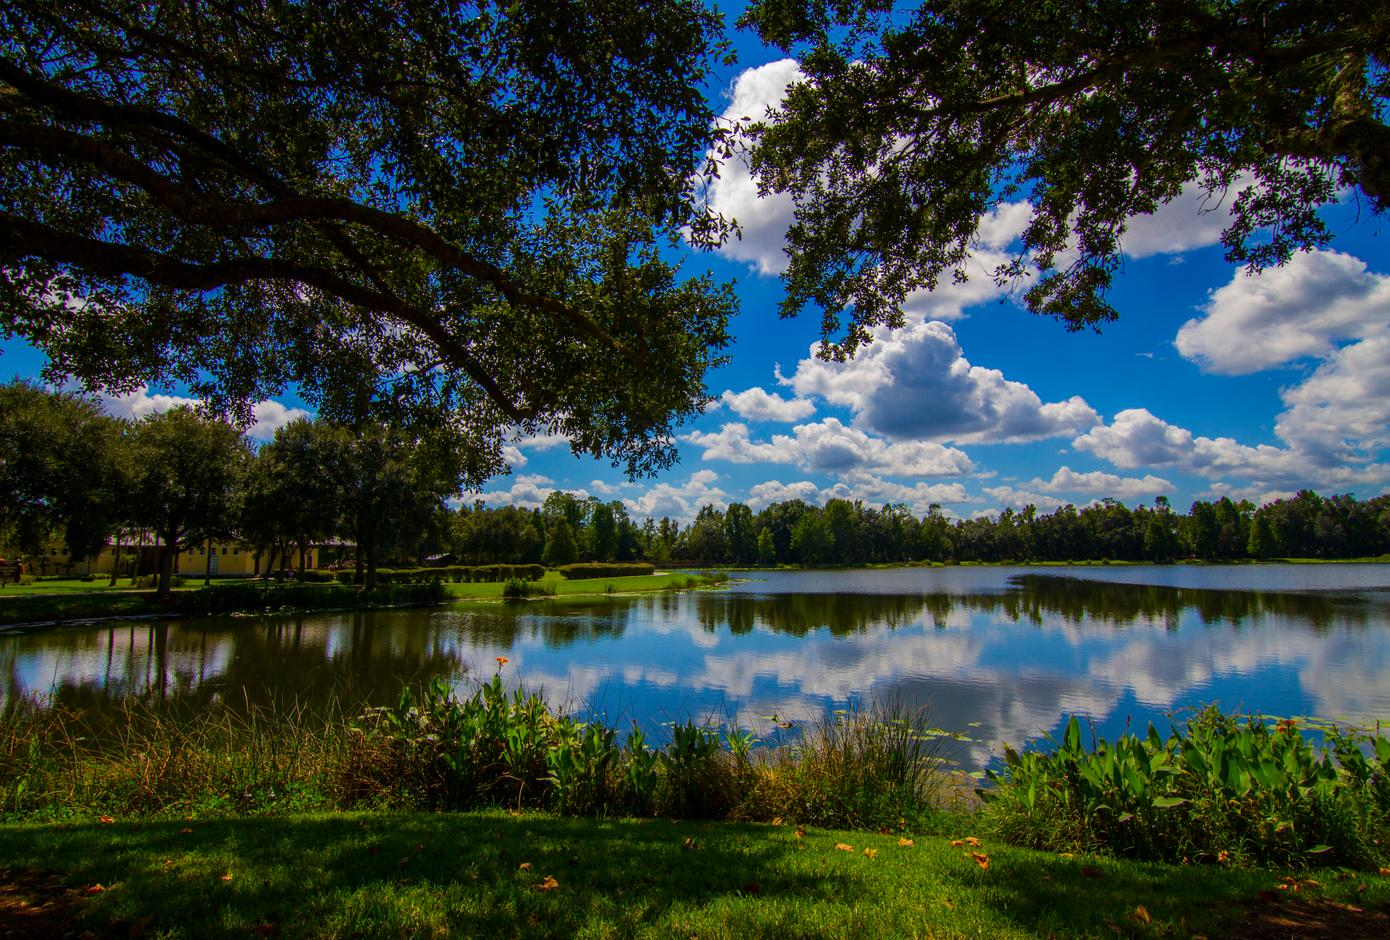 Lake in Orlando, Florida.